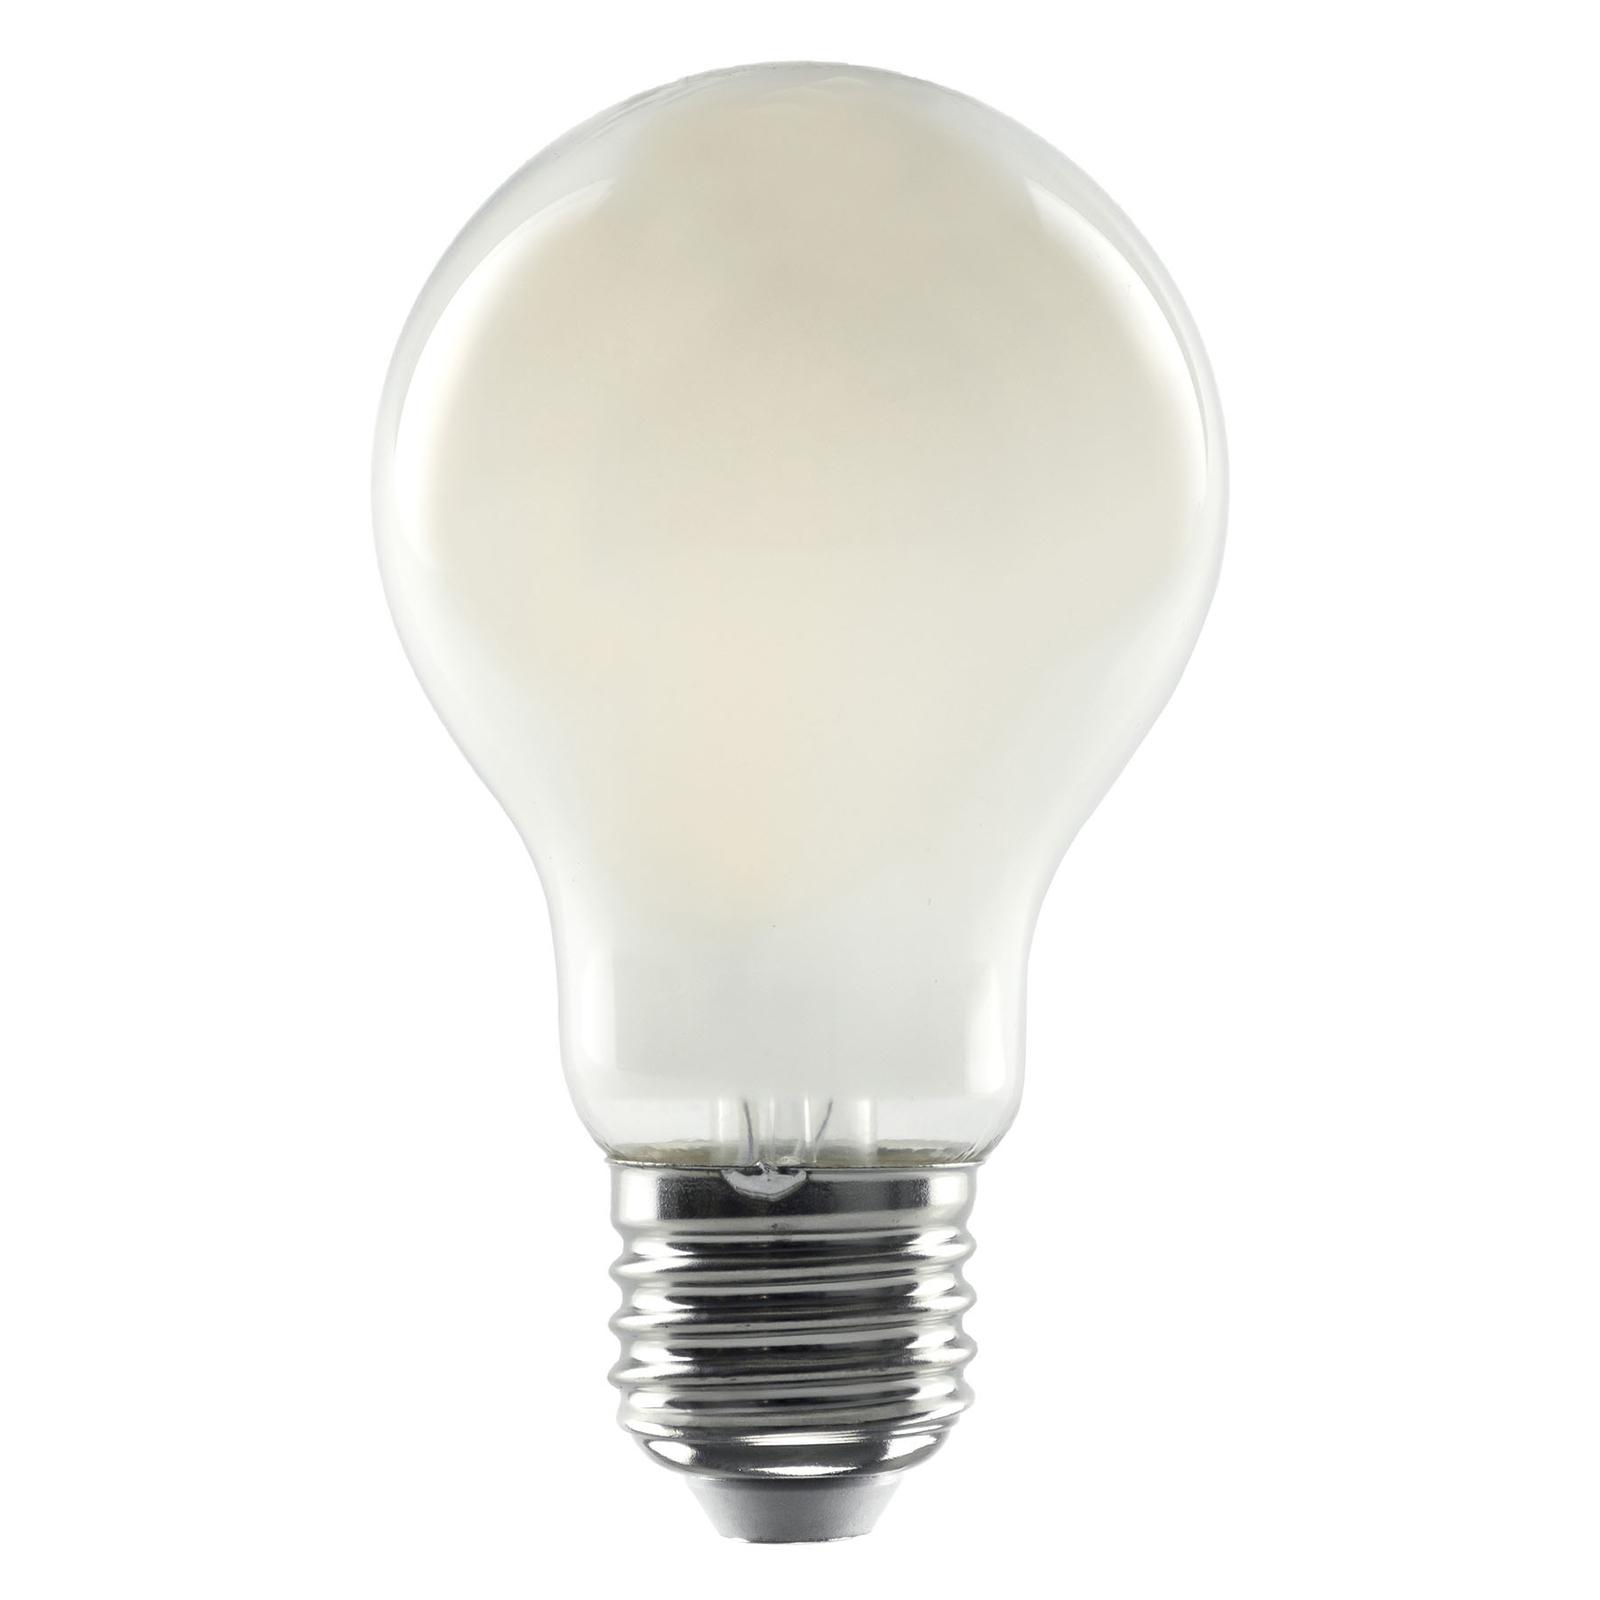 SEGULA LED-Lampe E27 10W 827 matt